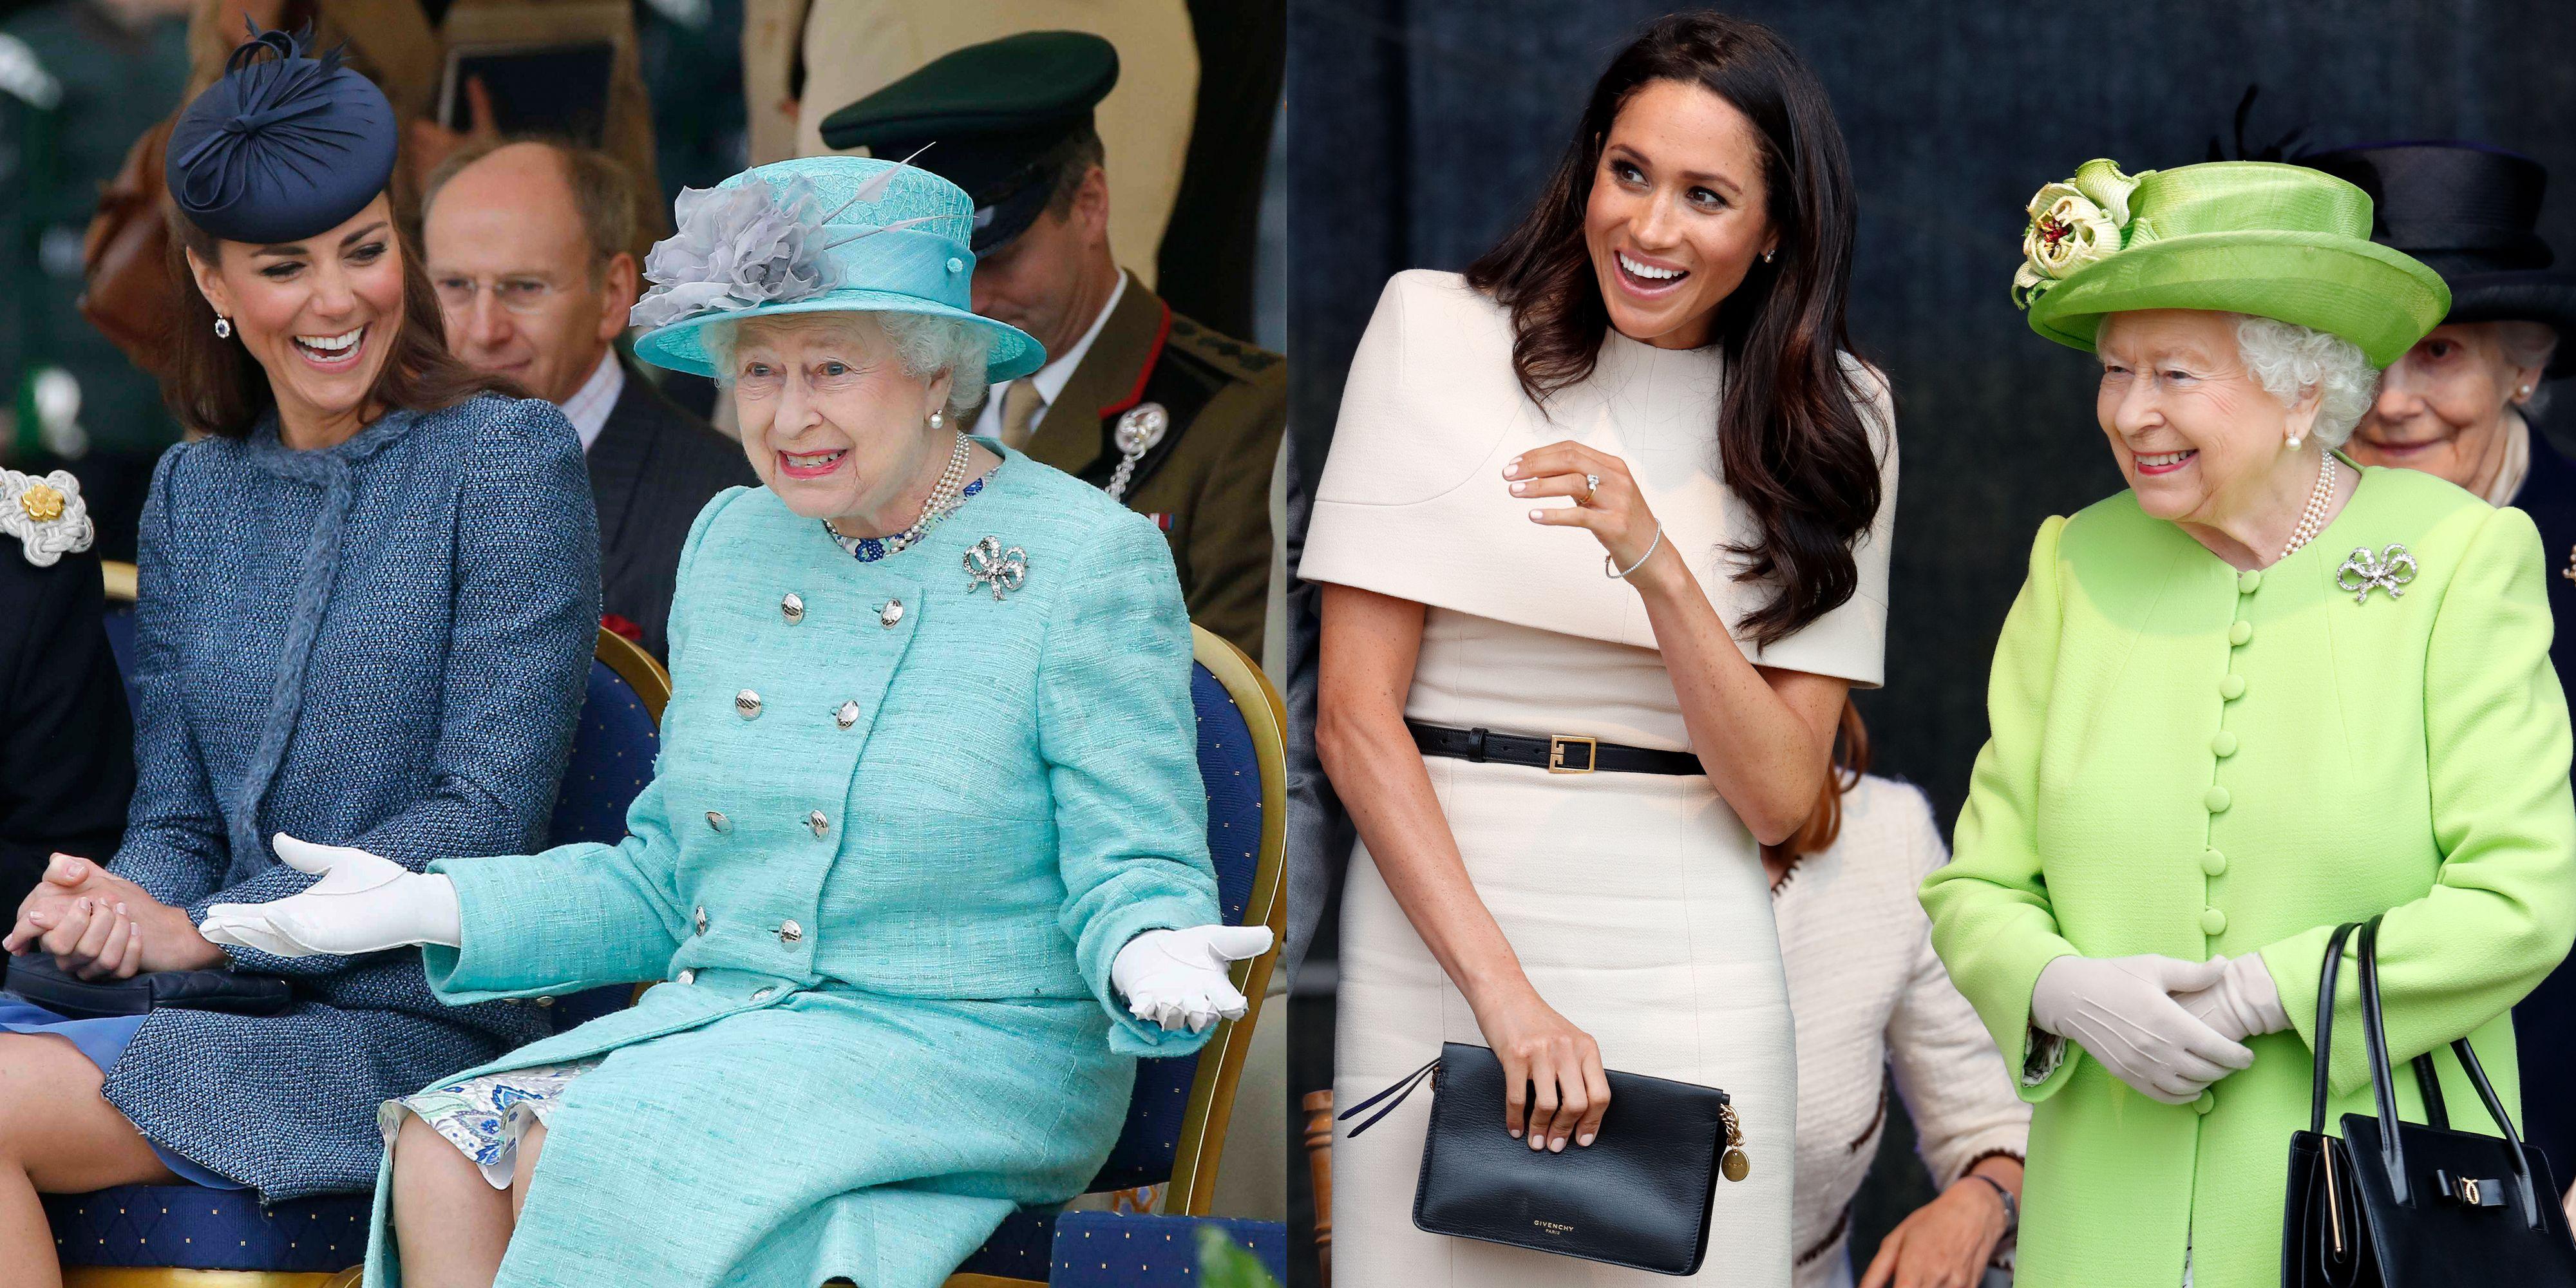 40 Times Queen Elizabeth Was Hilarious - Photos of Queen